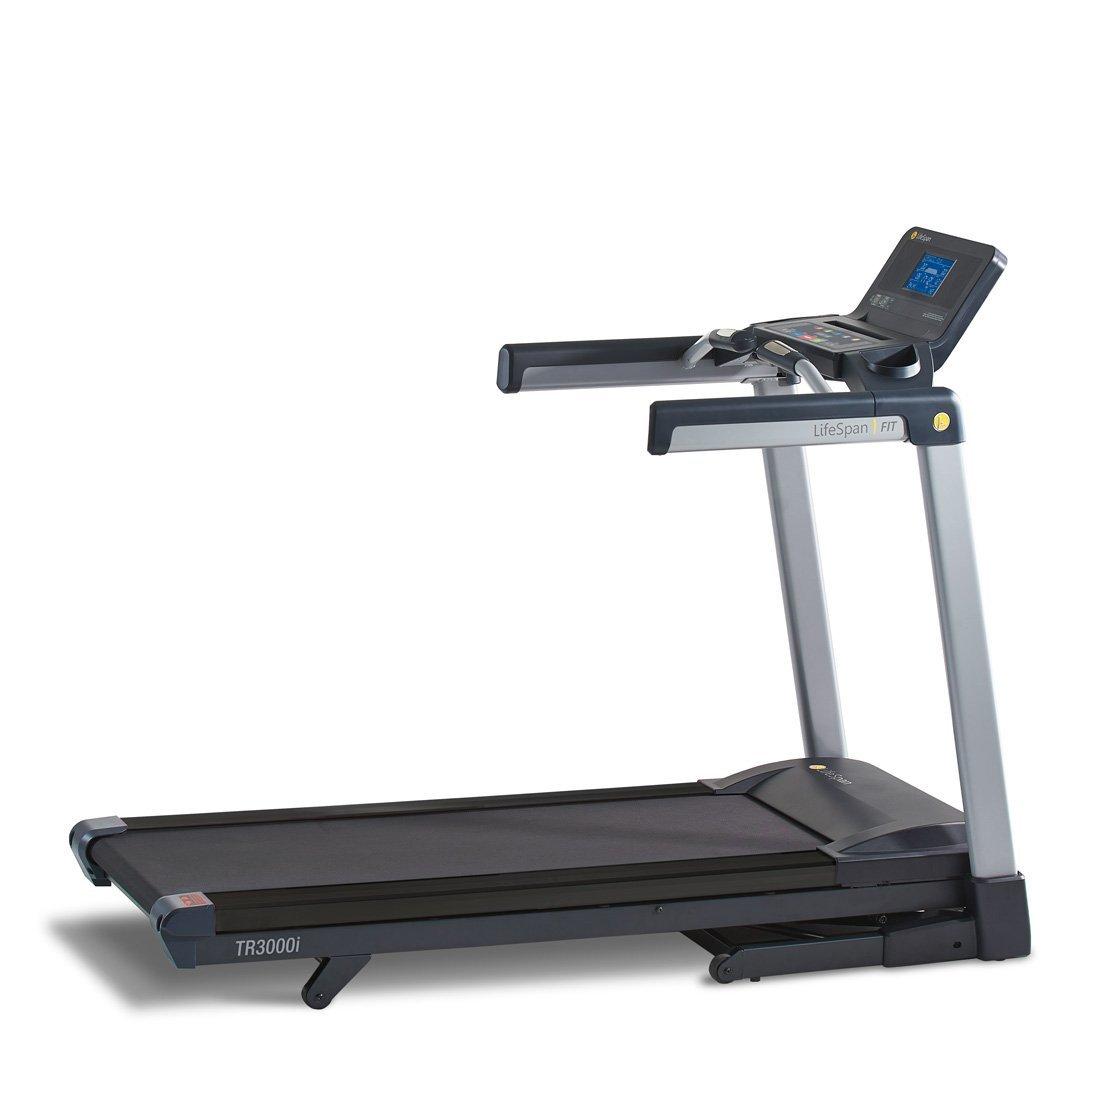 Lifespan TR4000i Folding Treadmill